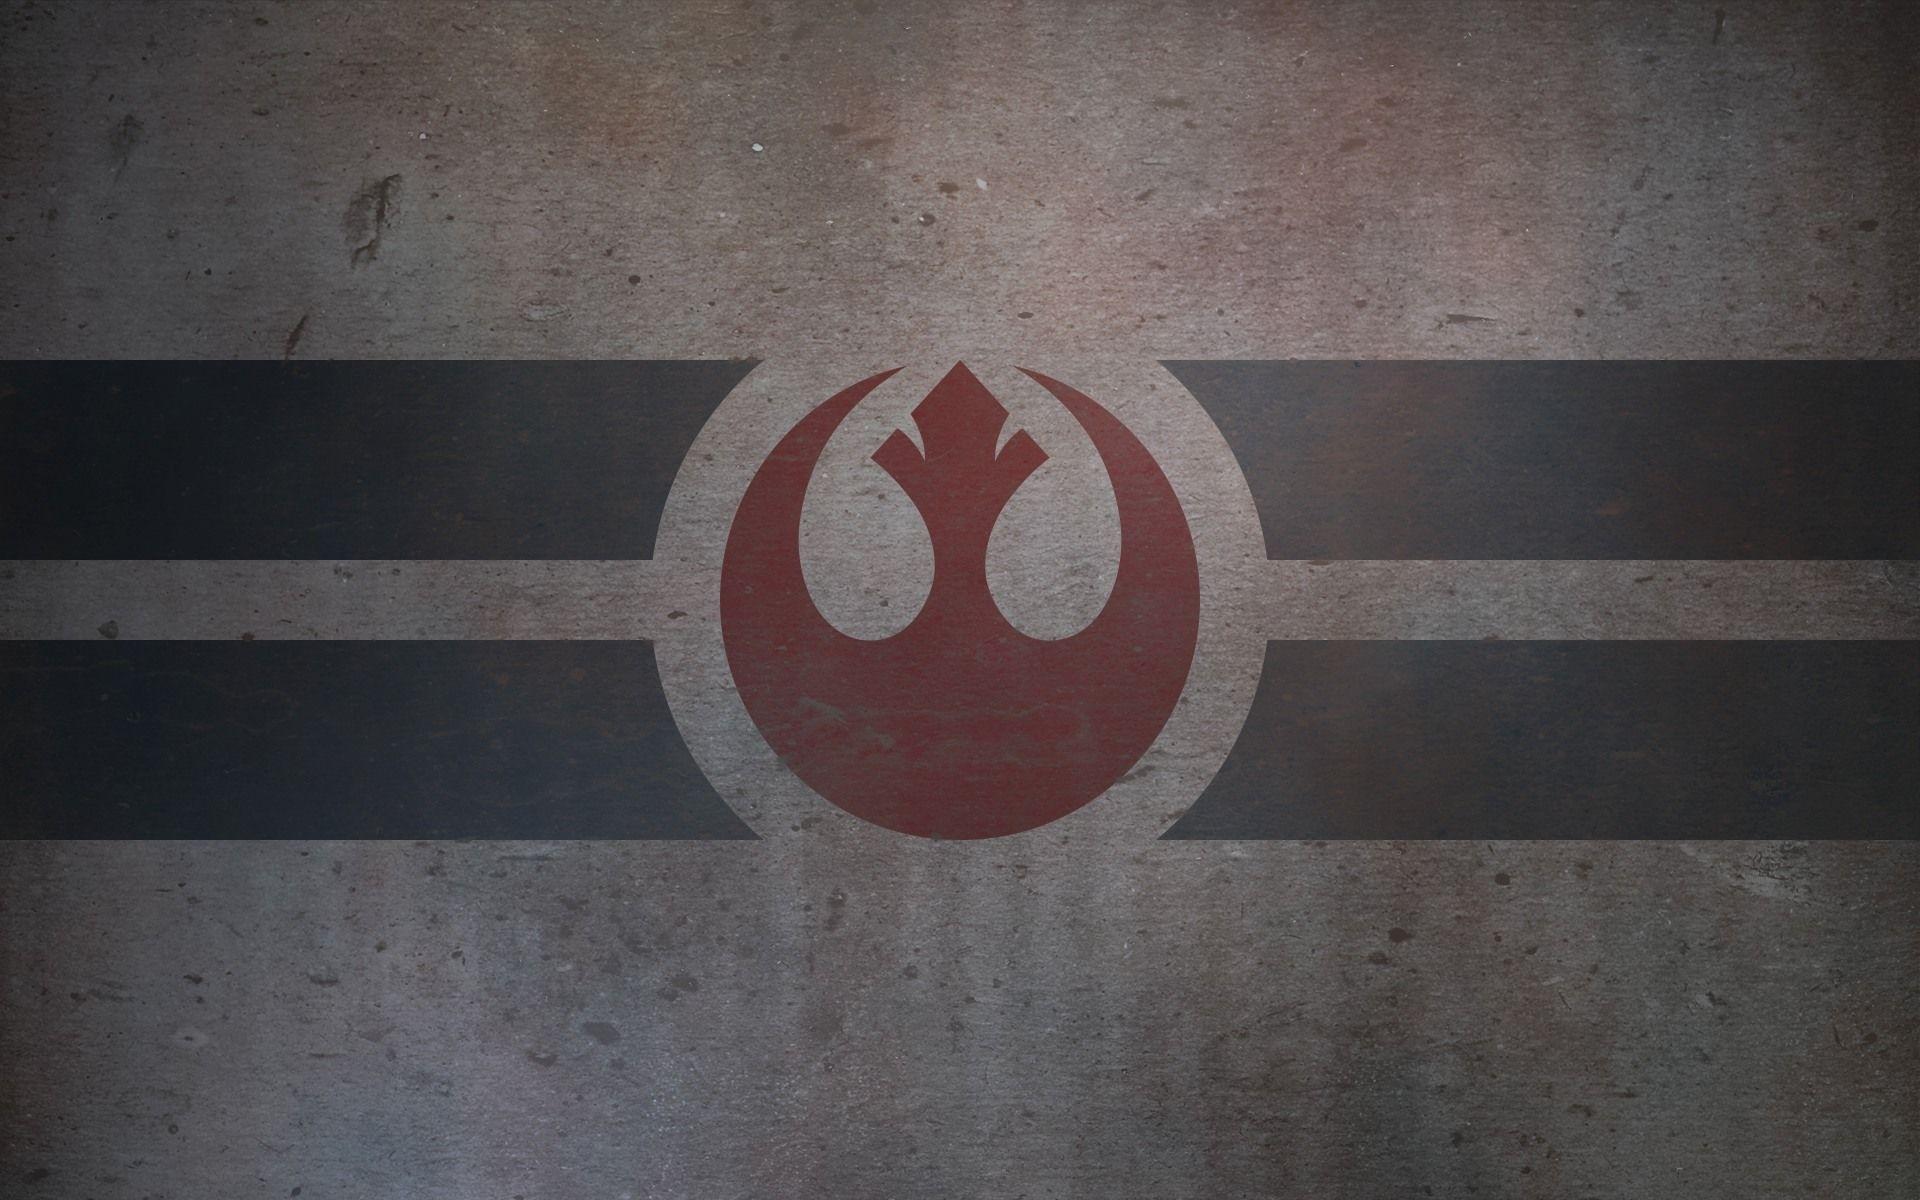 star wars rebels | star wars rebellion logo wallpaper | comics